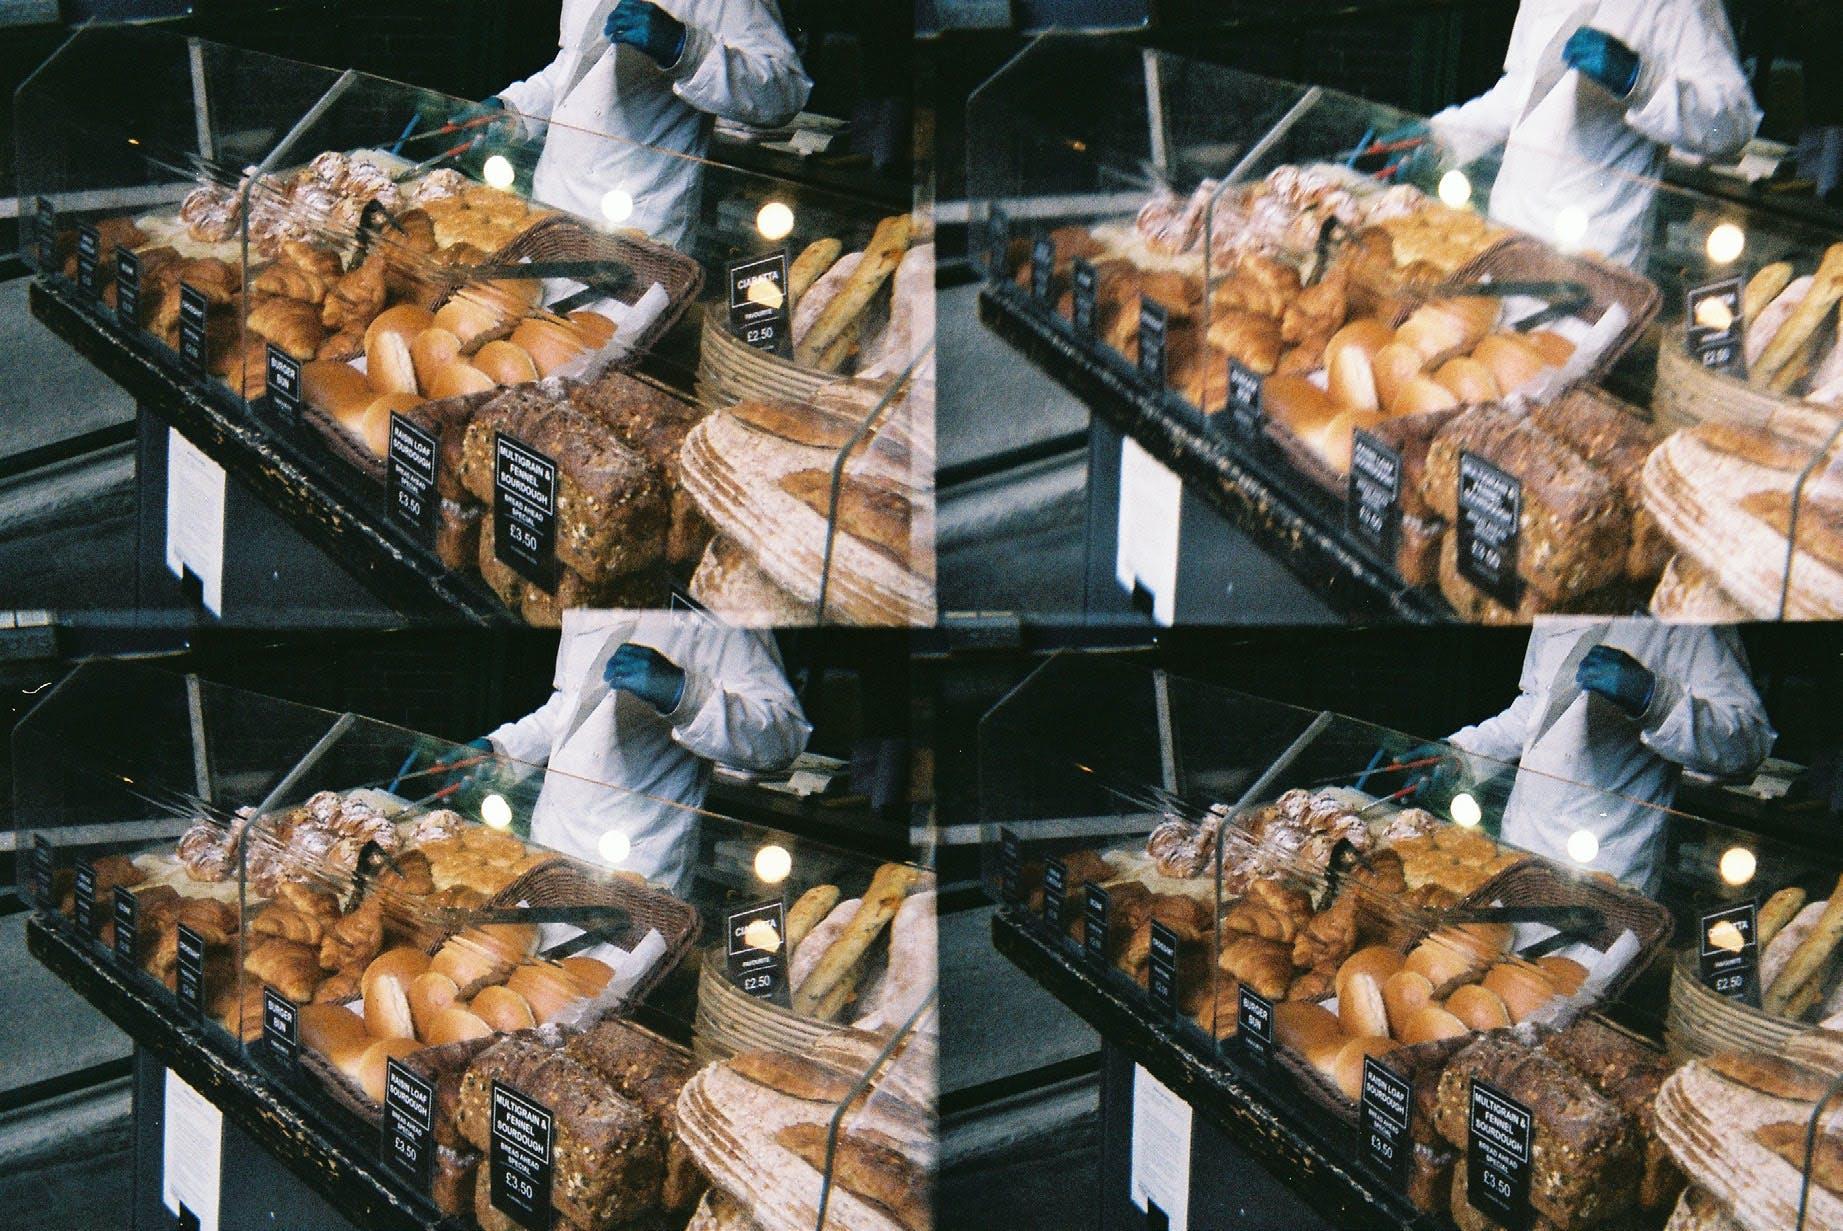 Bread Ahead Baked Goods